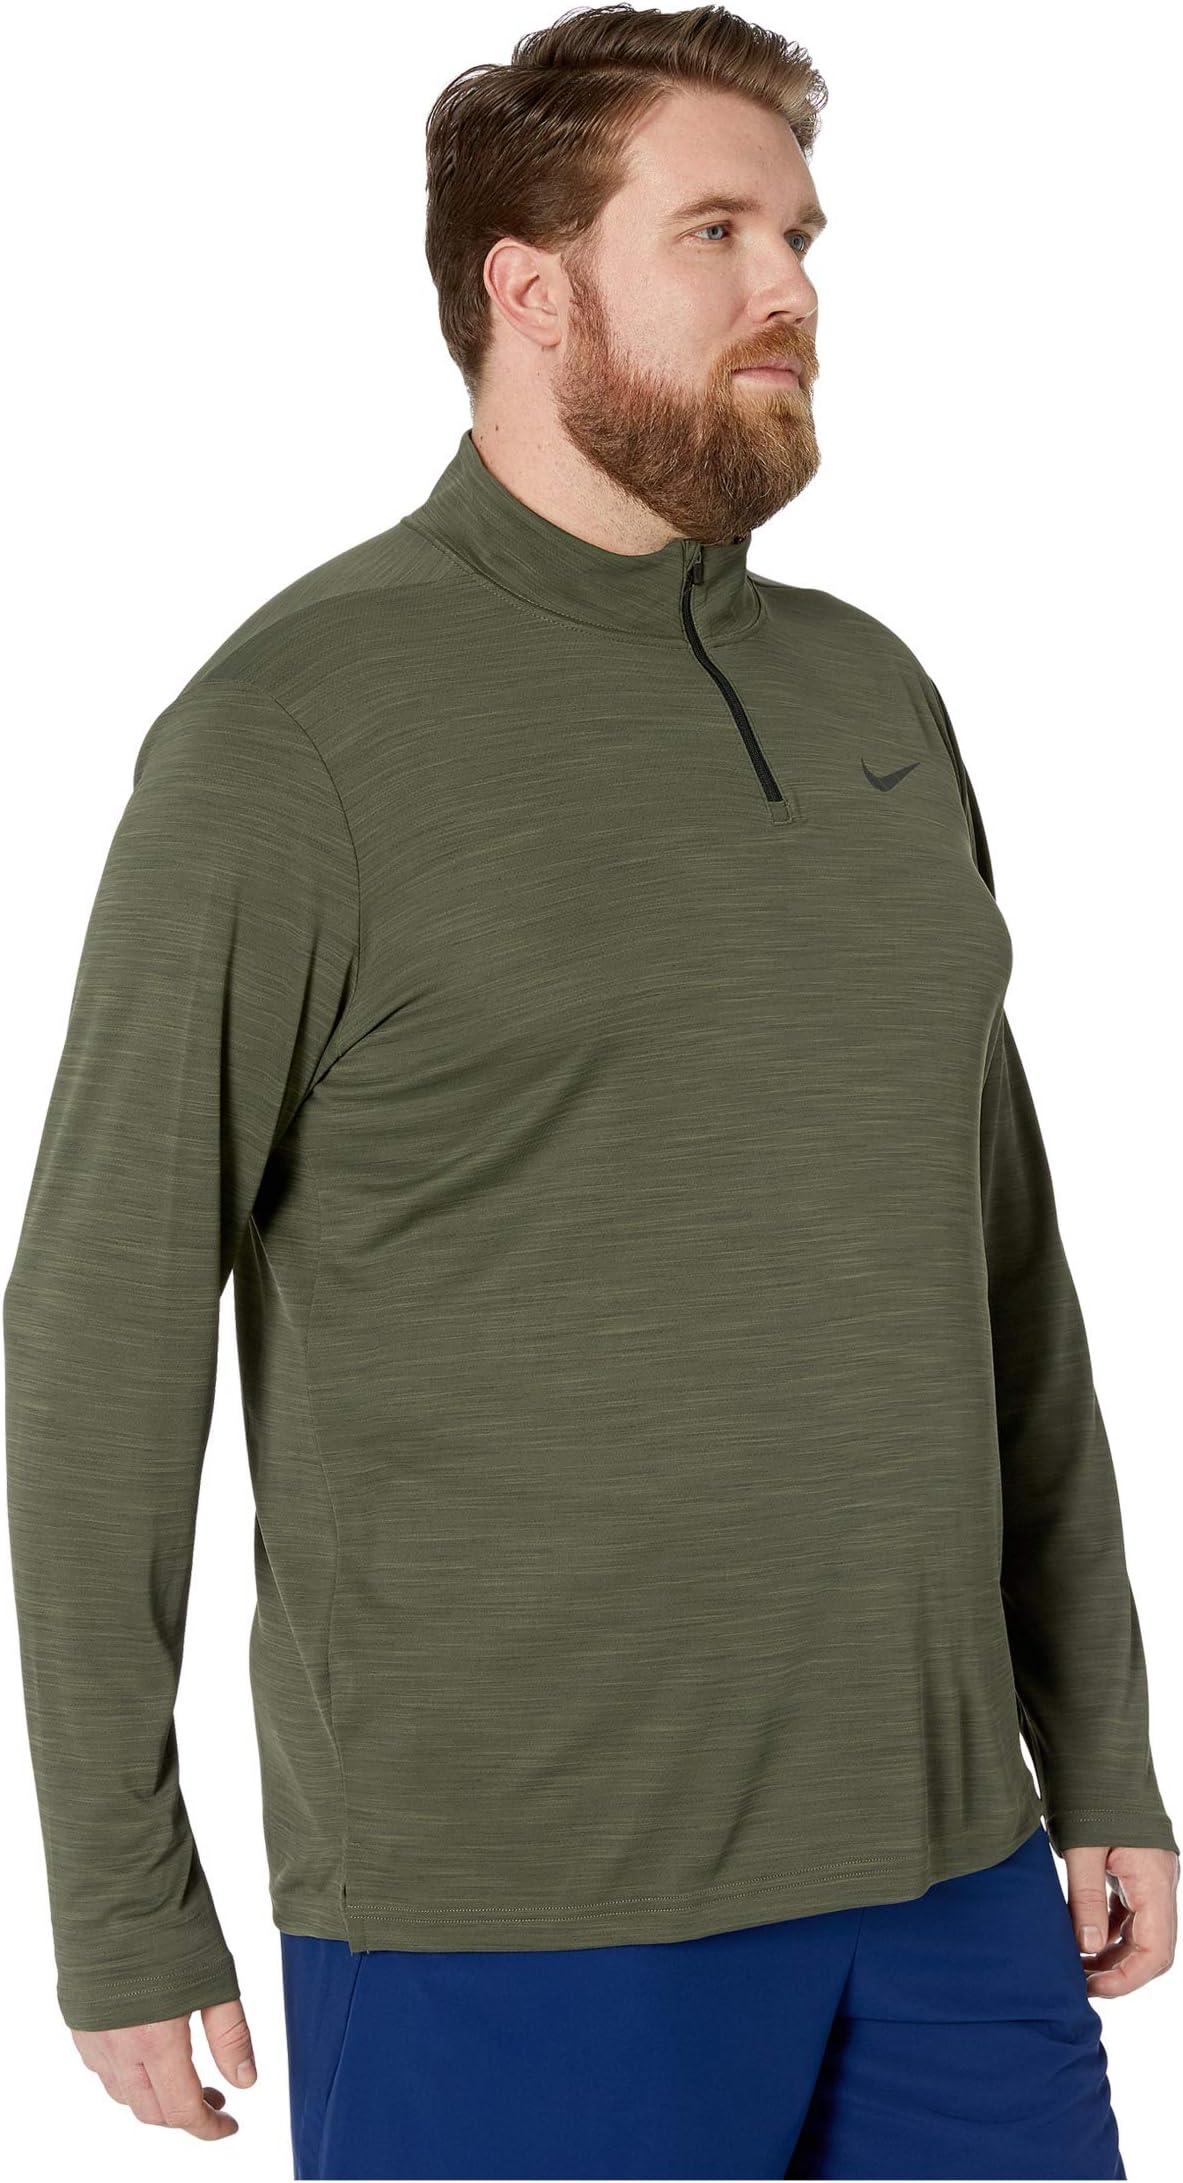 Nike Big & Tall Superset Top Long Sleeve 1/4 Zip e1RRV